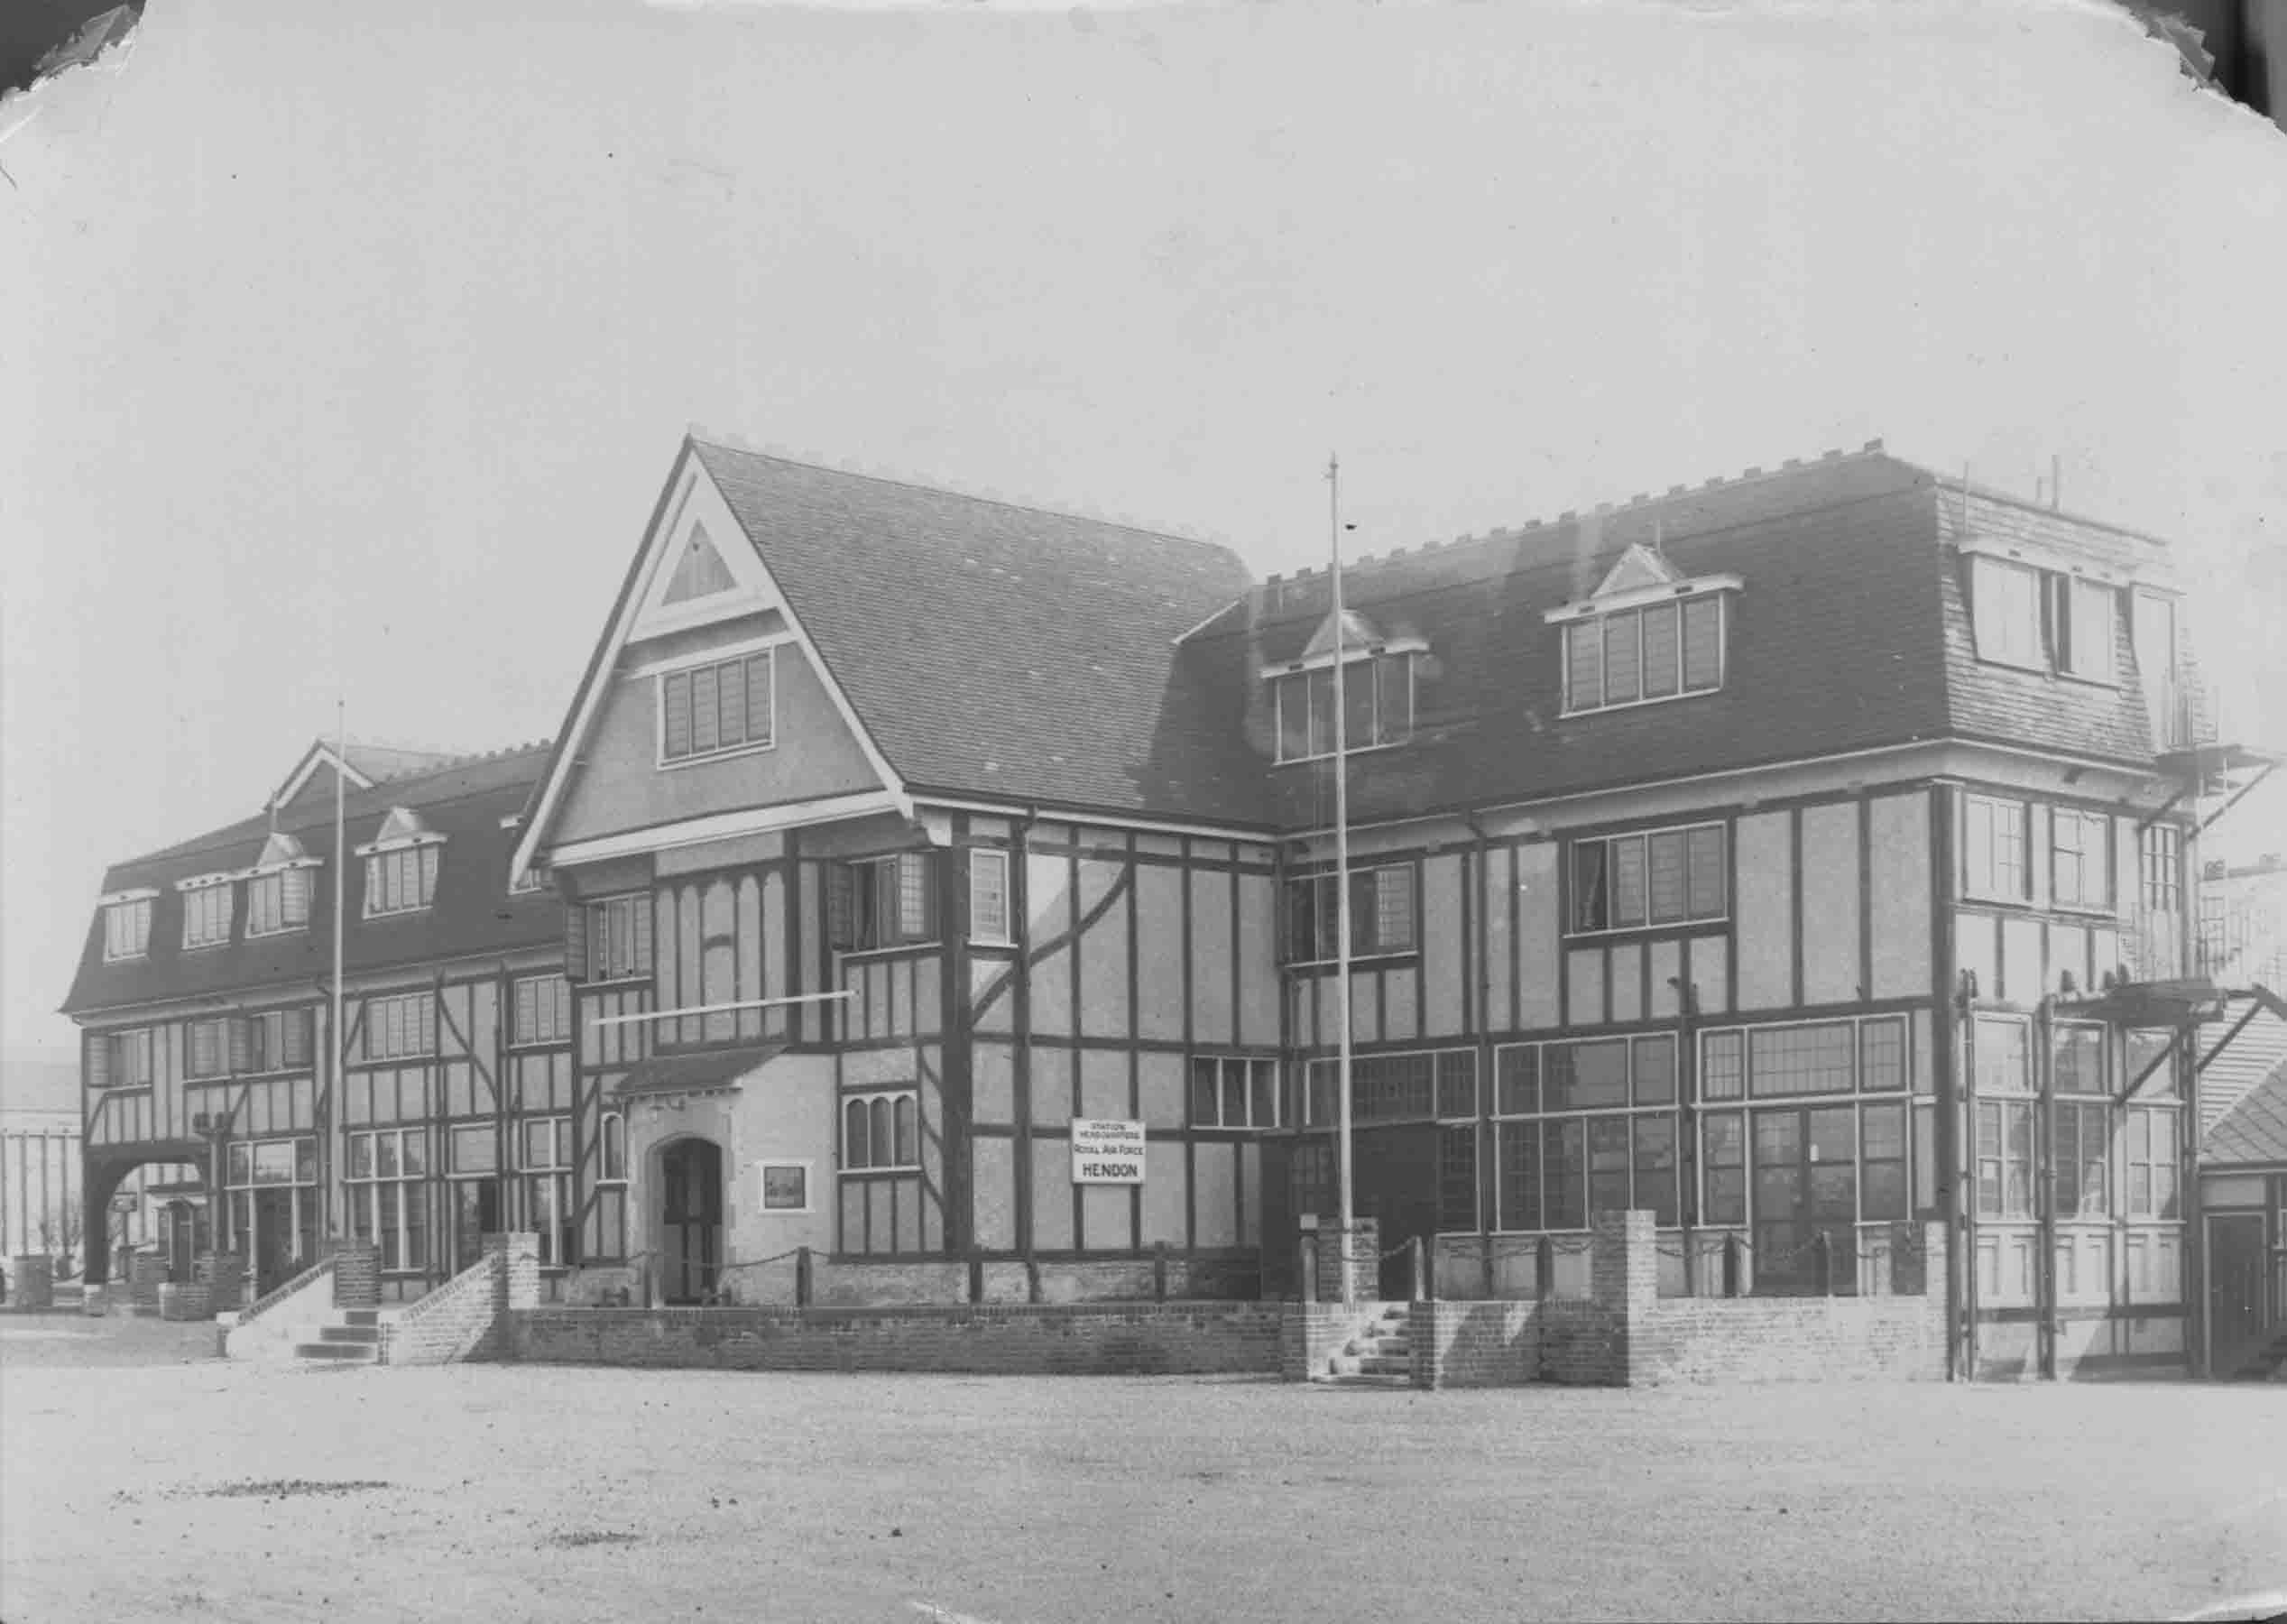 The former Officer's Mess building, now Platt Hall of Middlesex University